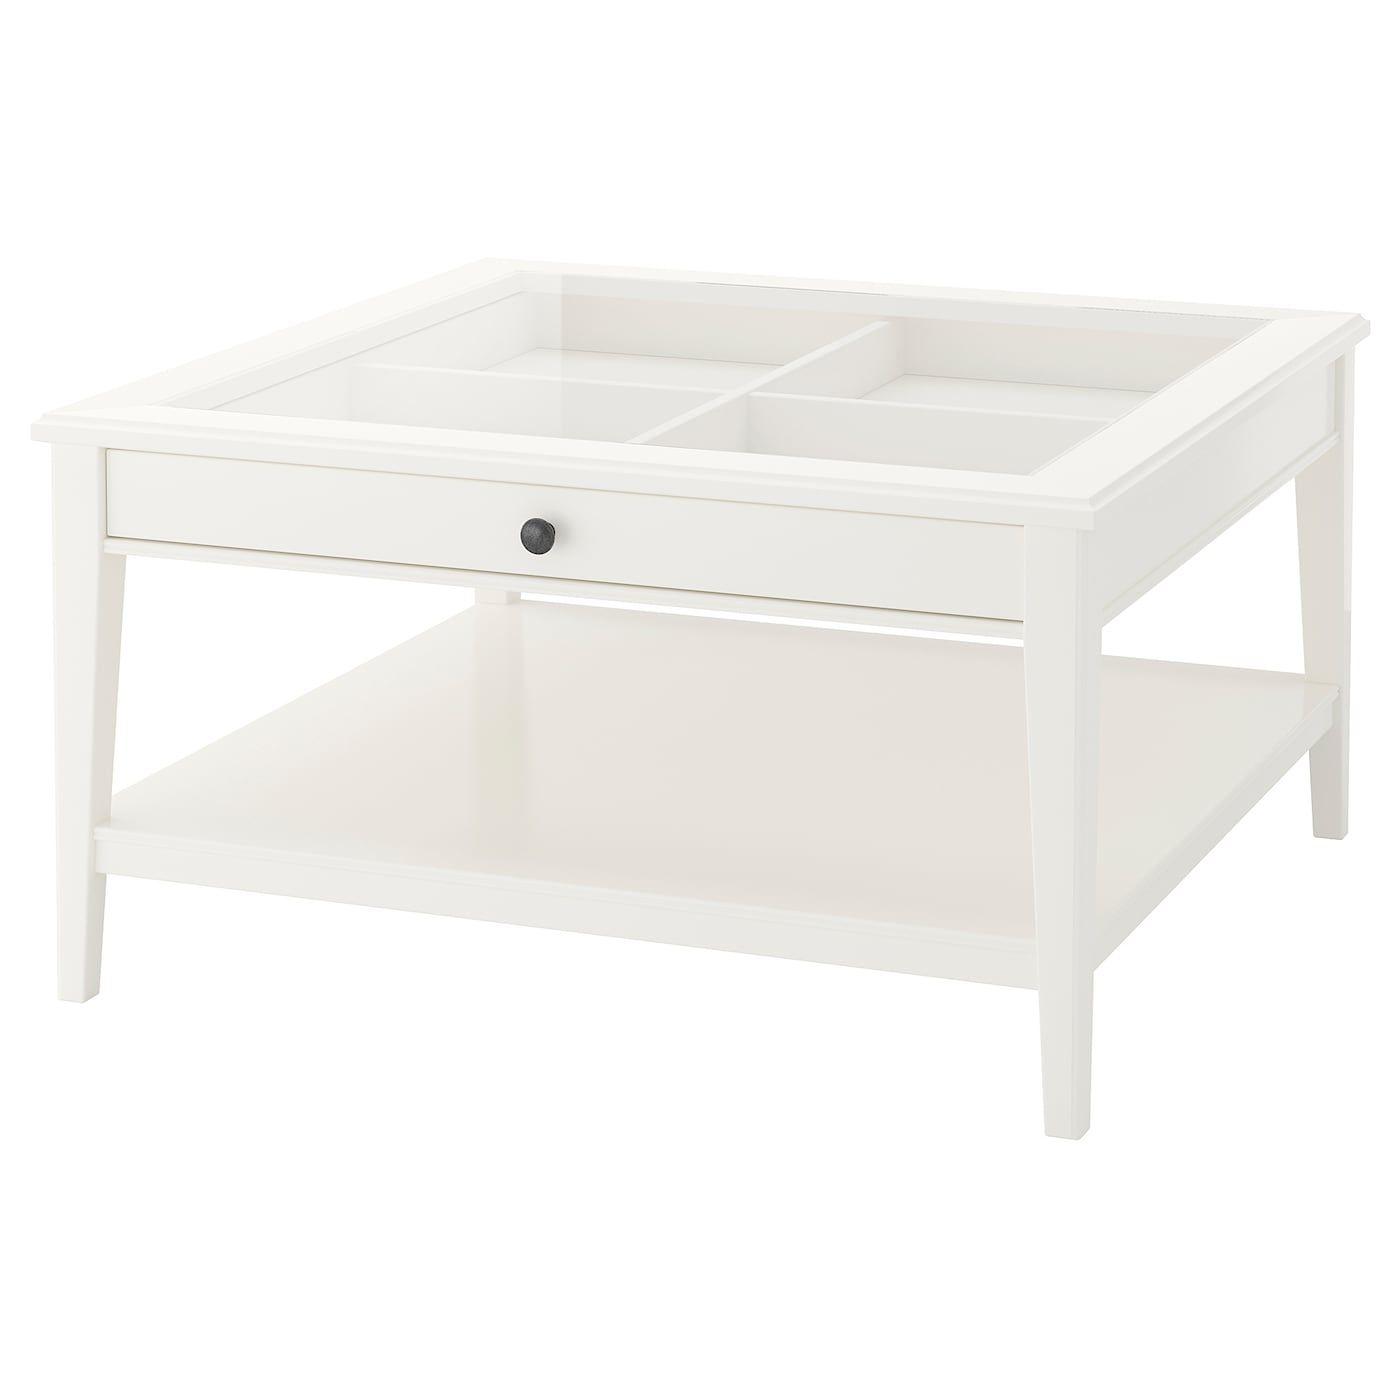 Liatorp Coffee Table White Glass 36 5 8x36 5 8 Ikea Liatorp Coffee Table White Ikea [ 1400 x 1400 Pixel ]